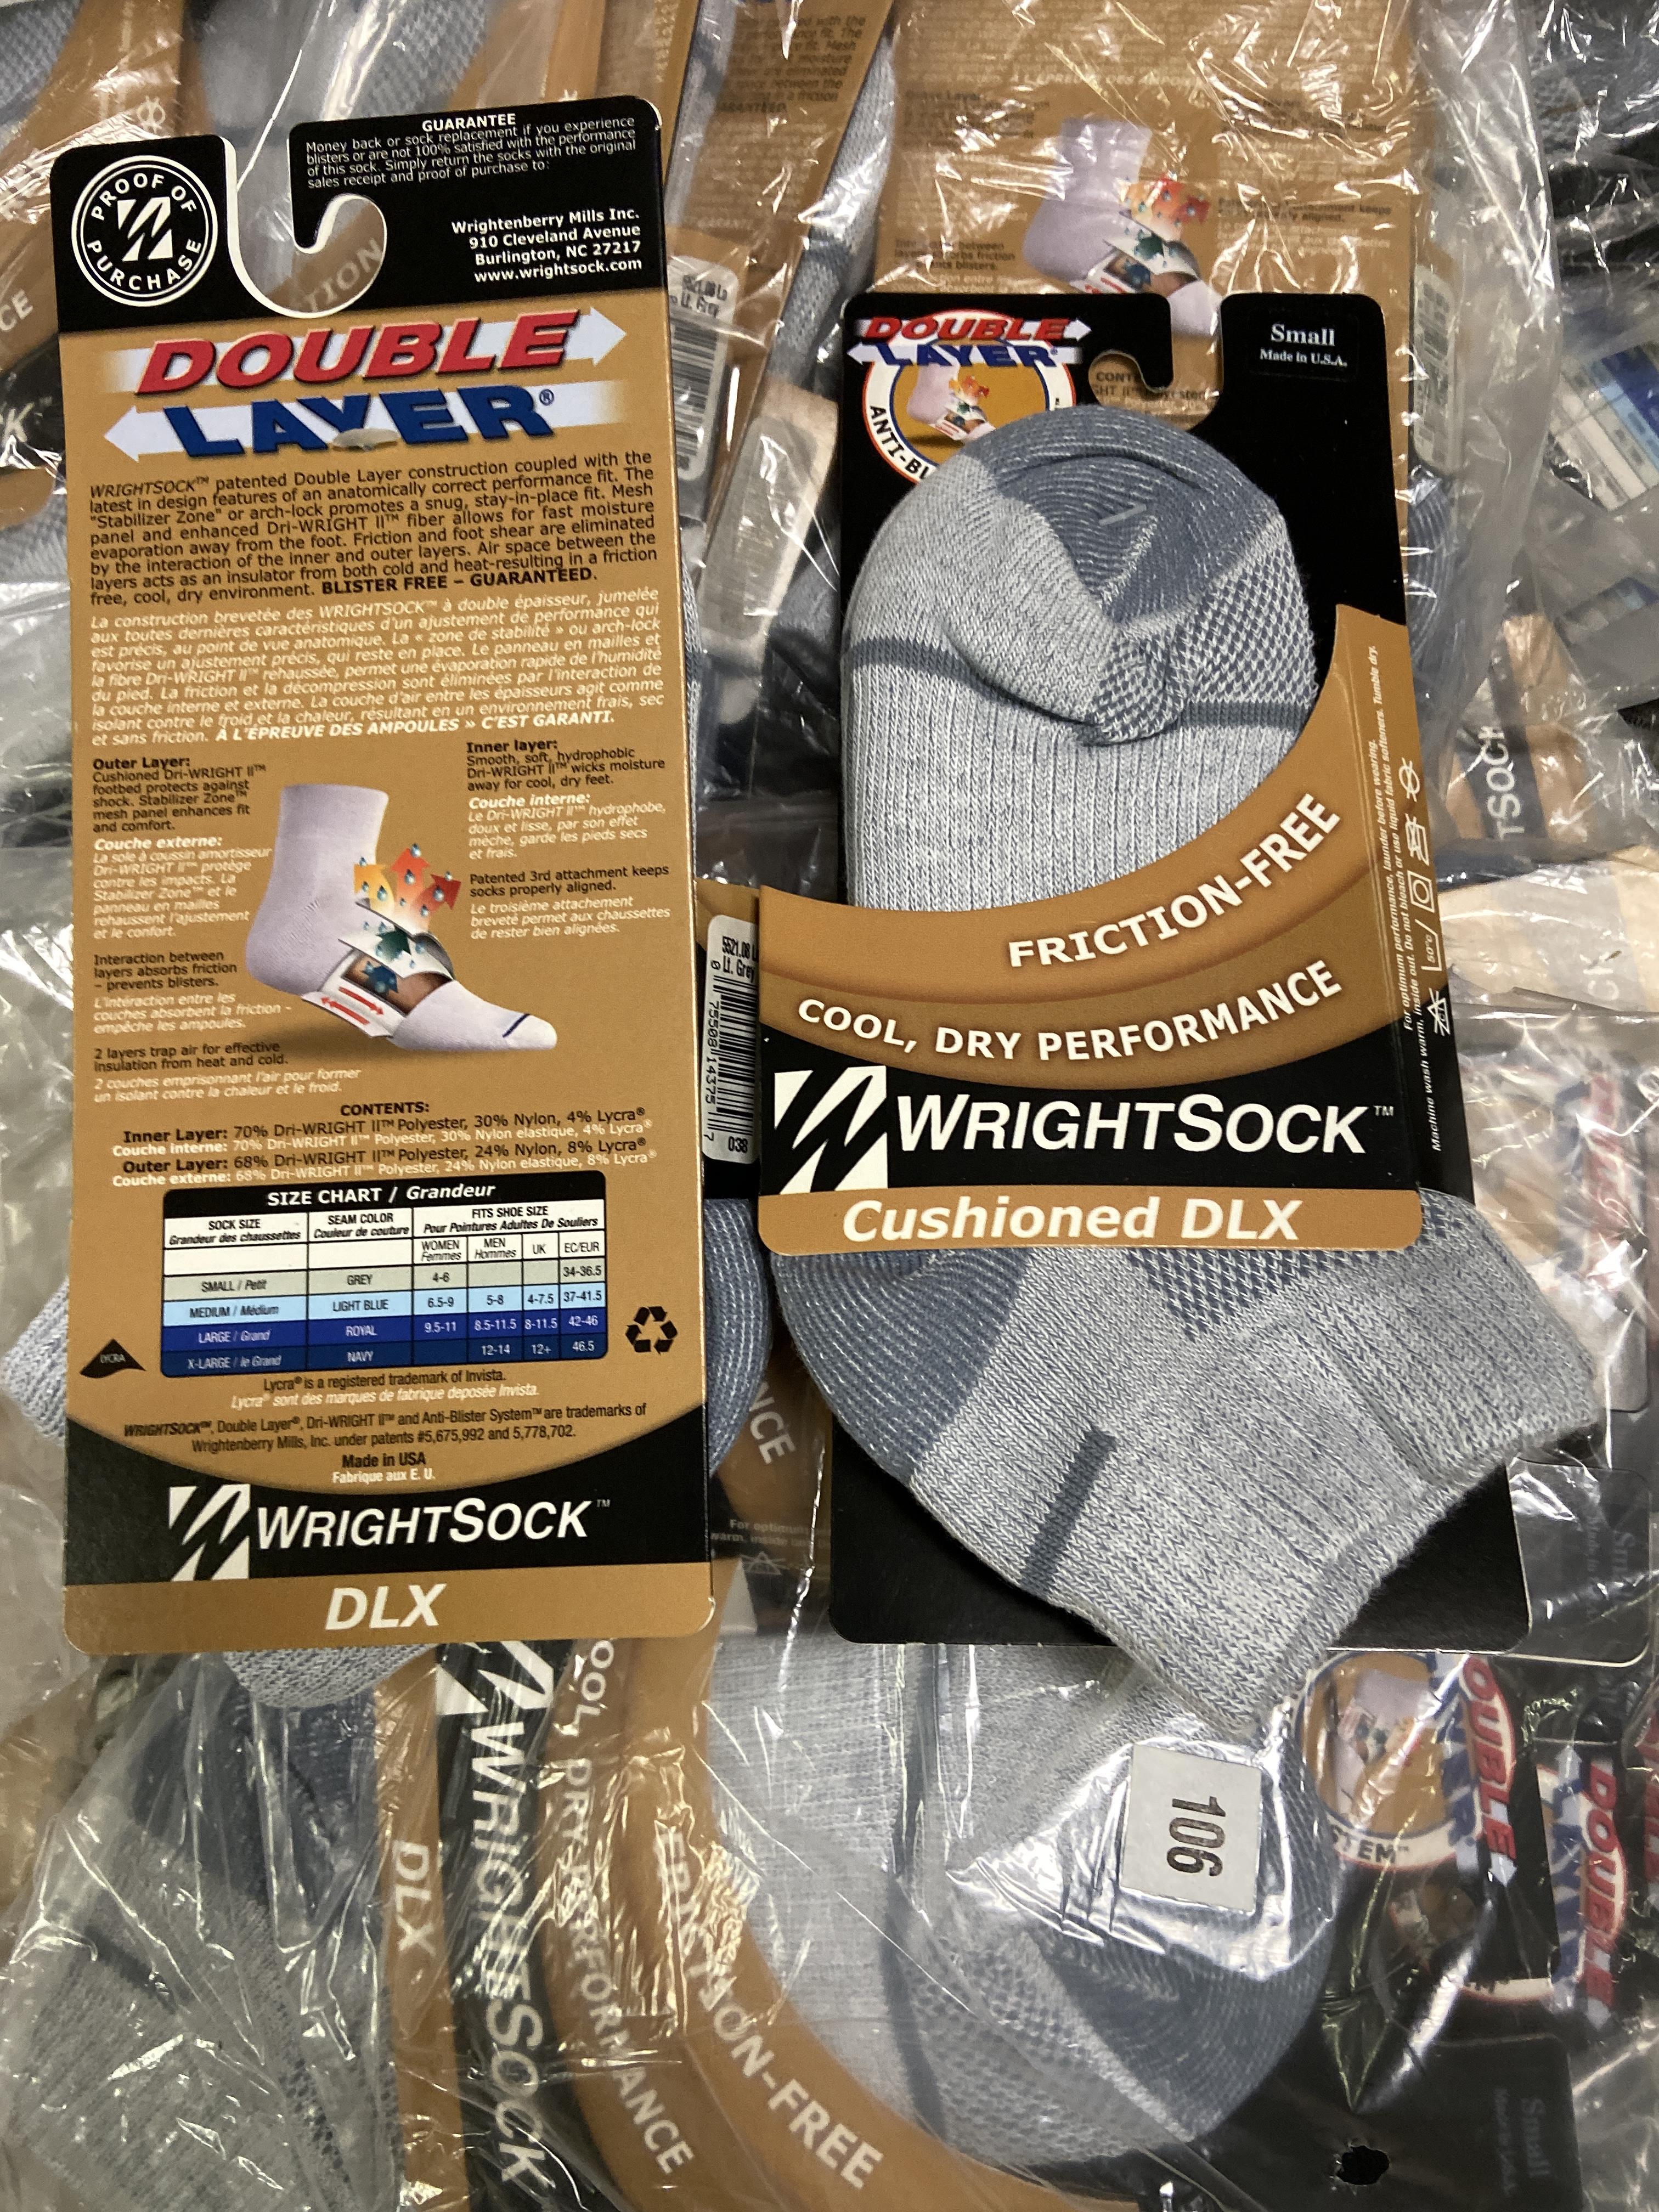 250+ packs of New Socks, Wrightsocks Cushioned DLX, Gray - Image 2 of 2